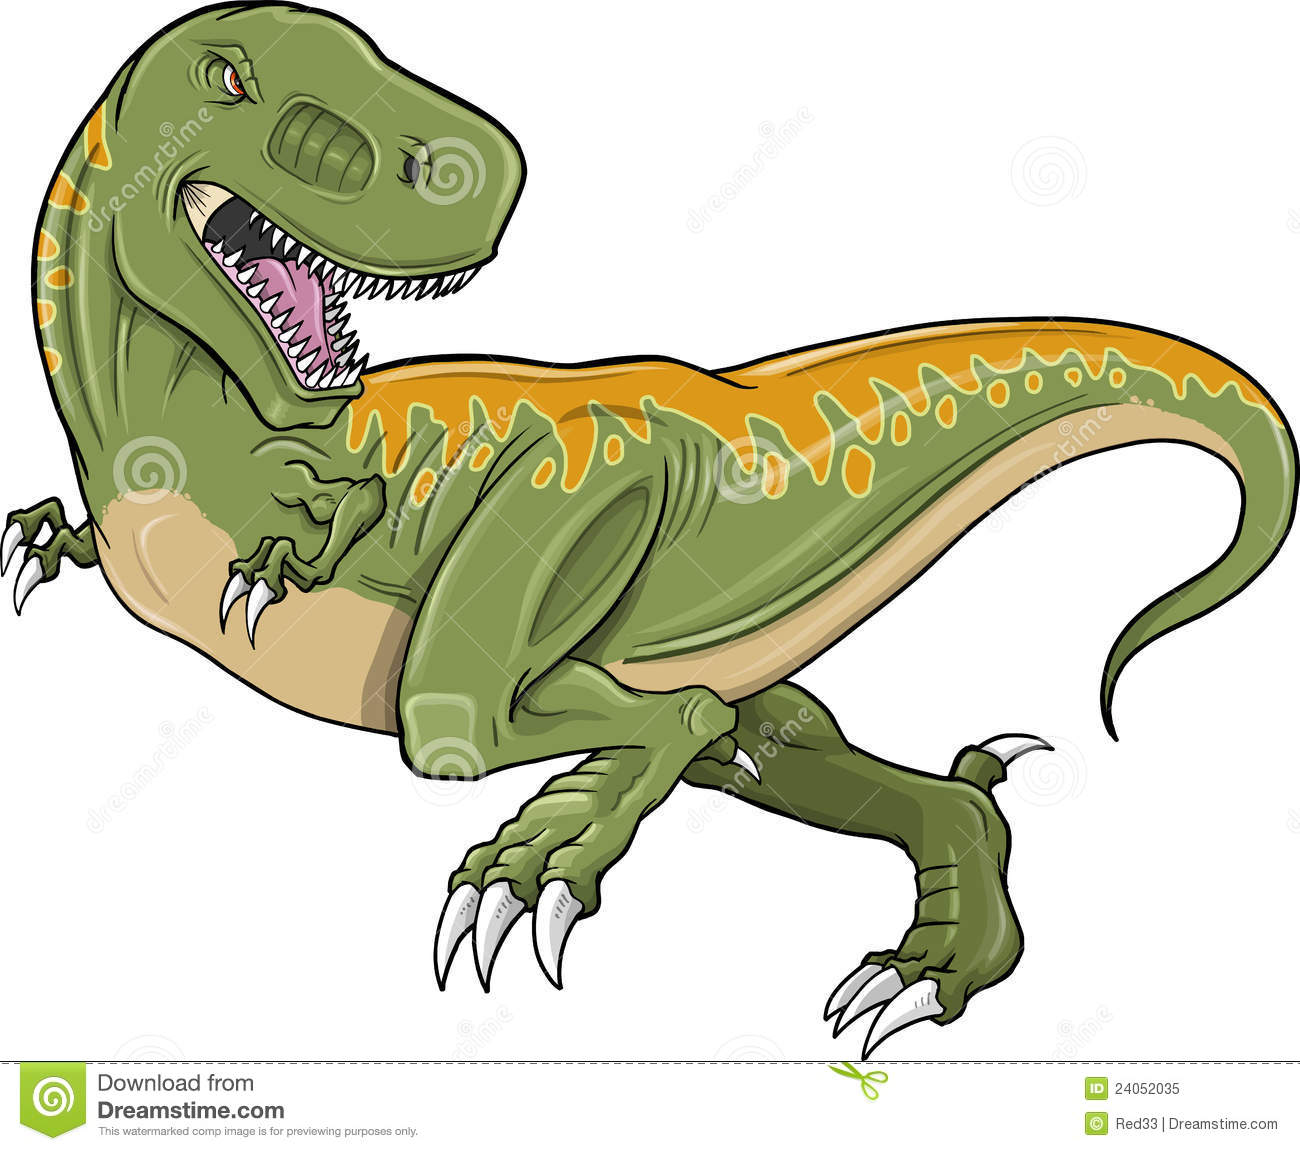 tyrannosaurus rex dinosaur clipart panda free clipart images rh clipartpanda com t rex clip art free t rex clip art black and white